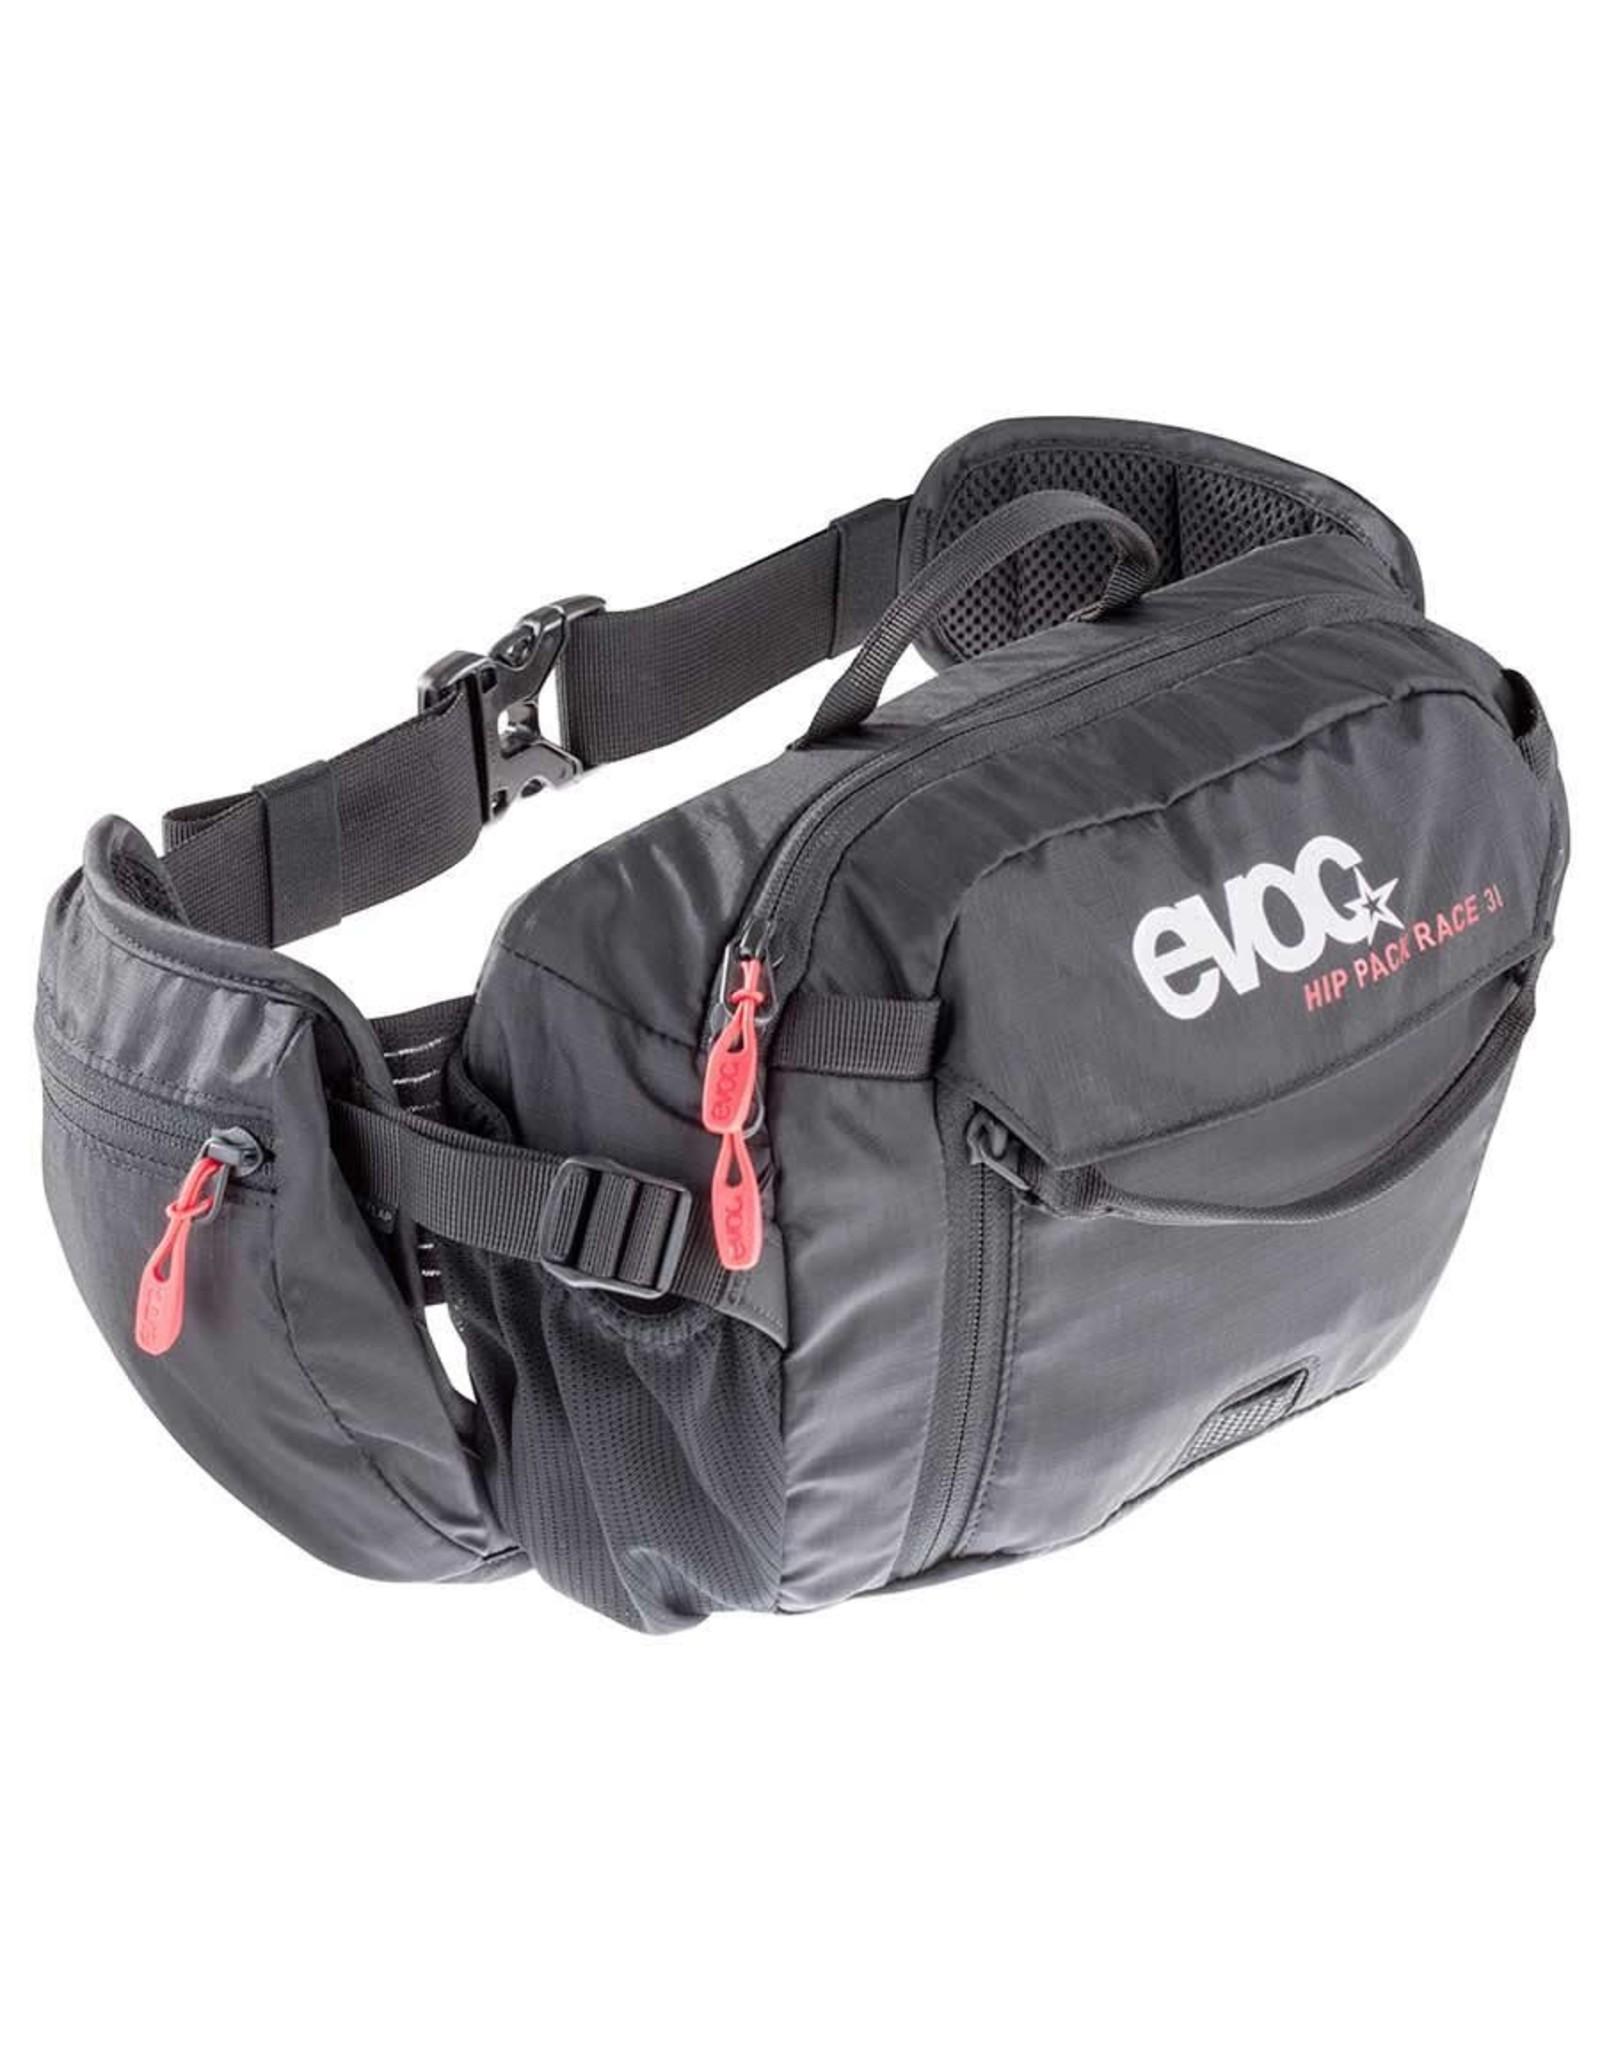 EVOC EVOC Hip Pack Race, Volume: 3L, Bladder: 1.5L, Black